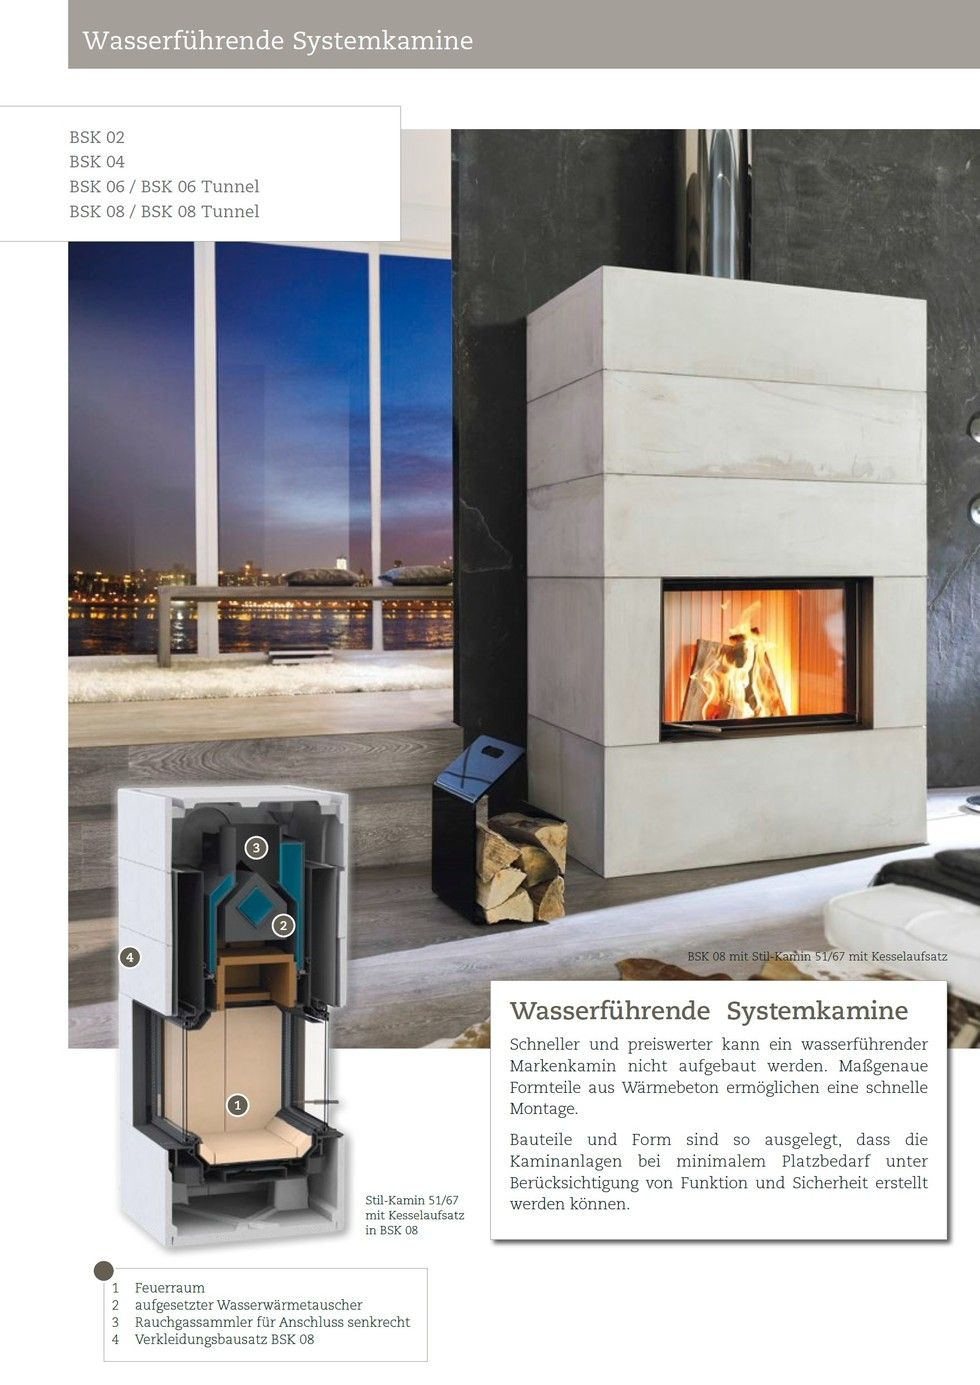 brunner kamin wasserf hrend einen kamin selber bauen haus pinterest kamin selber bauen. Black Bedroom Furniture Sets. Home Design Ideas